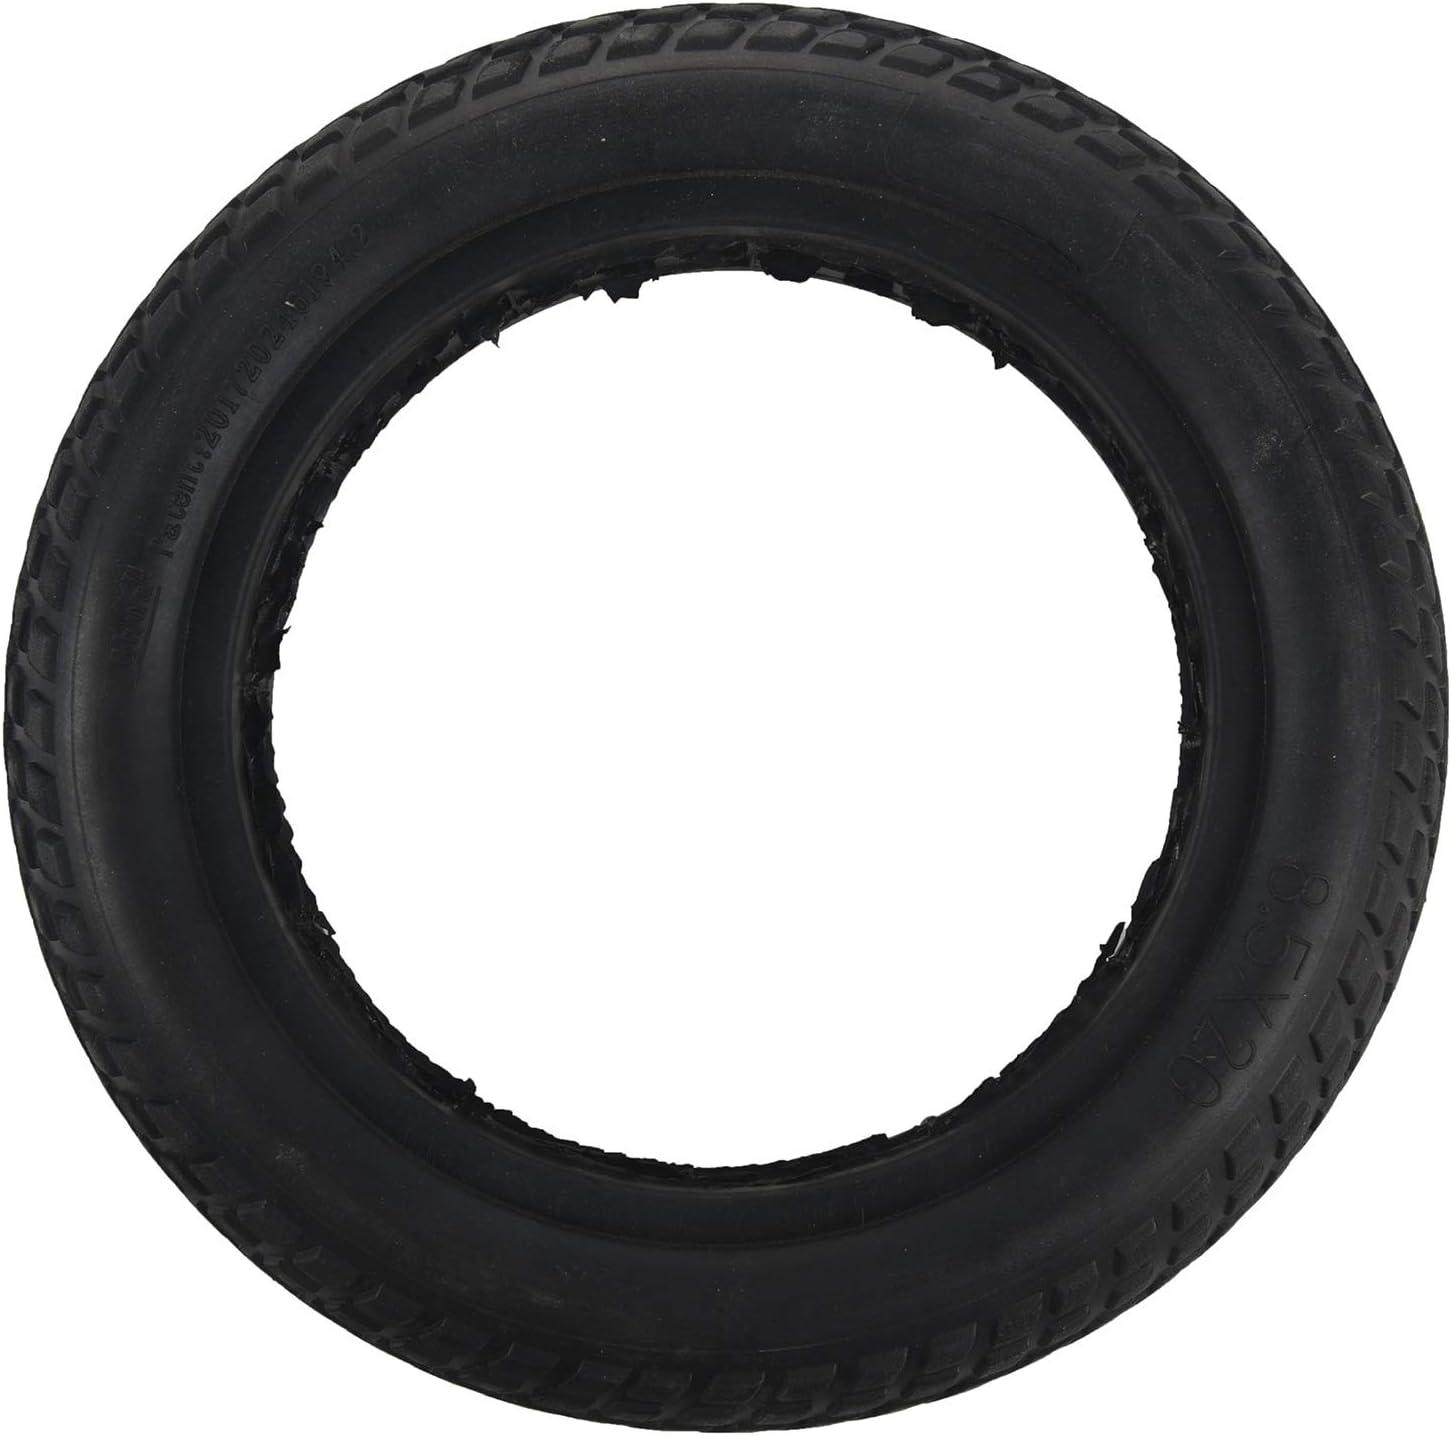 Tashido Damping - Scooter Hollow Solid Tyre para Mijia M365 Skateboard Scooter Tire 8,5 pulgadas Tyre Wheel neumático de goma no neumático para scooter